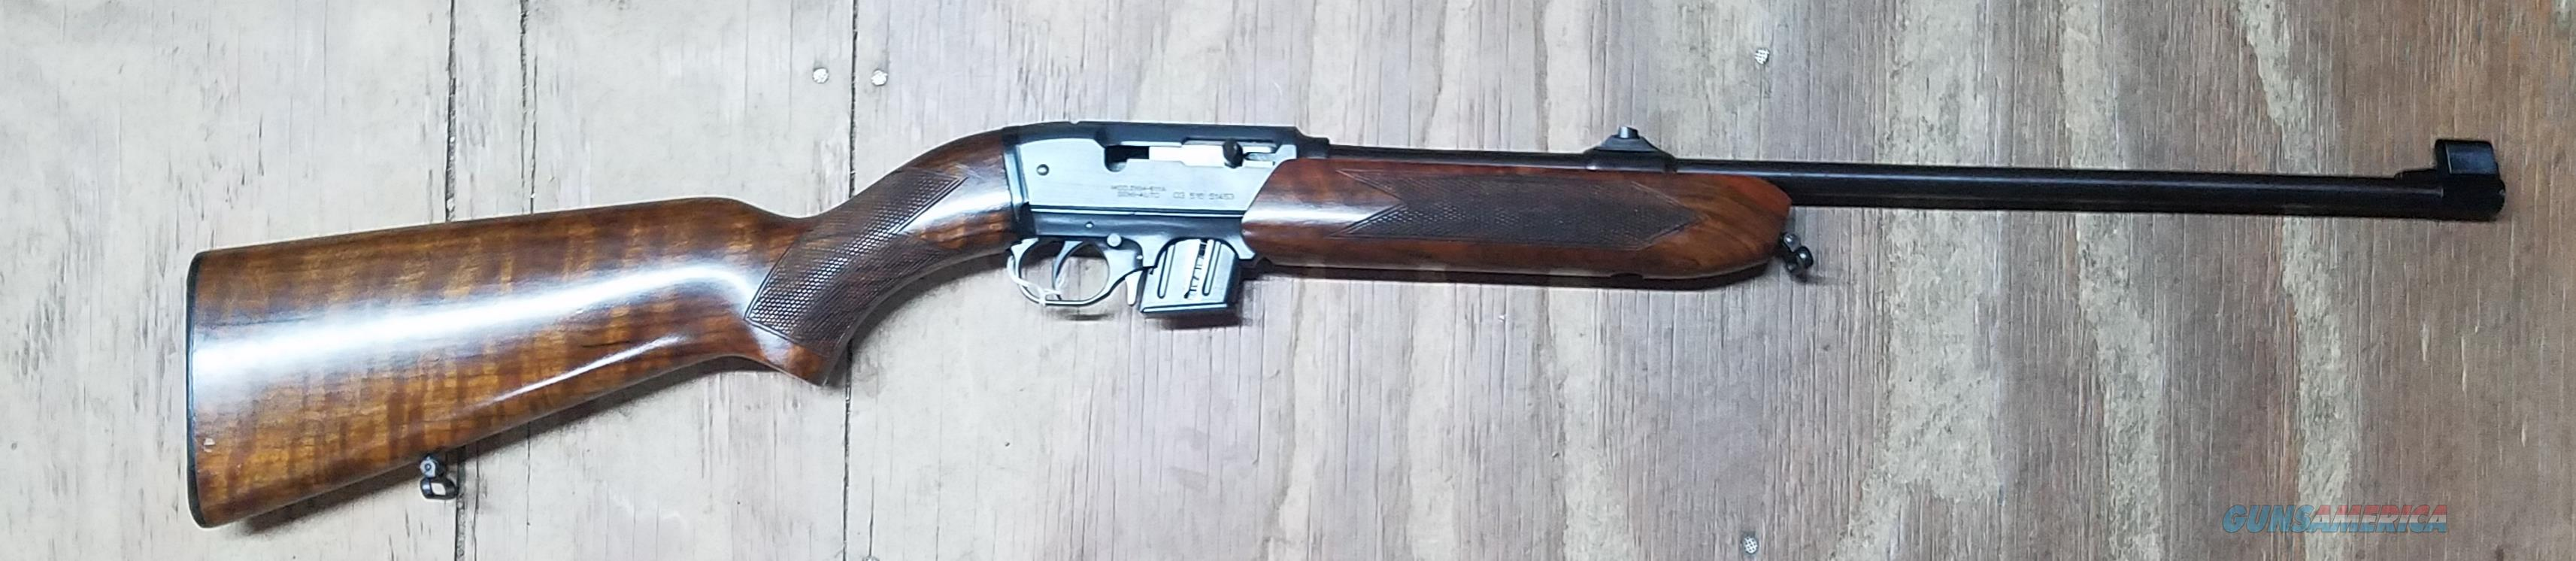 Brno Arms ZKM-611A .22 WMR (Mag) Semi-Automatic rifle CZ USA  Guns > Rifles > CZ Rifles